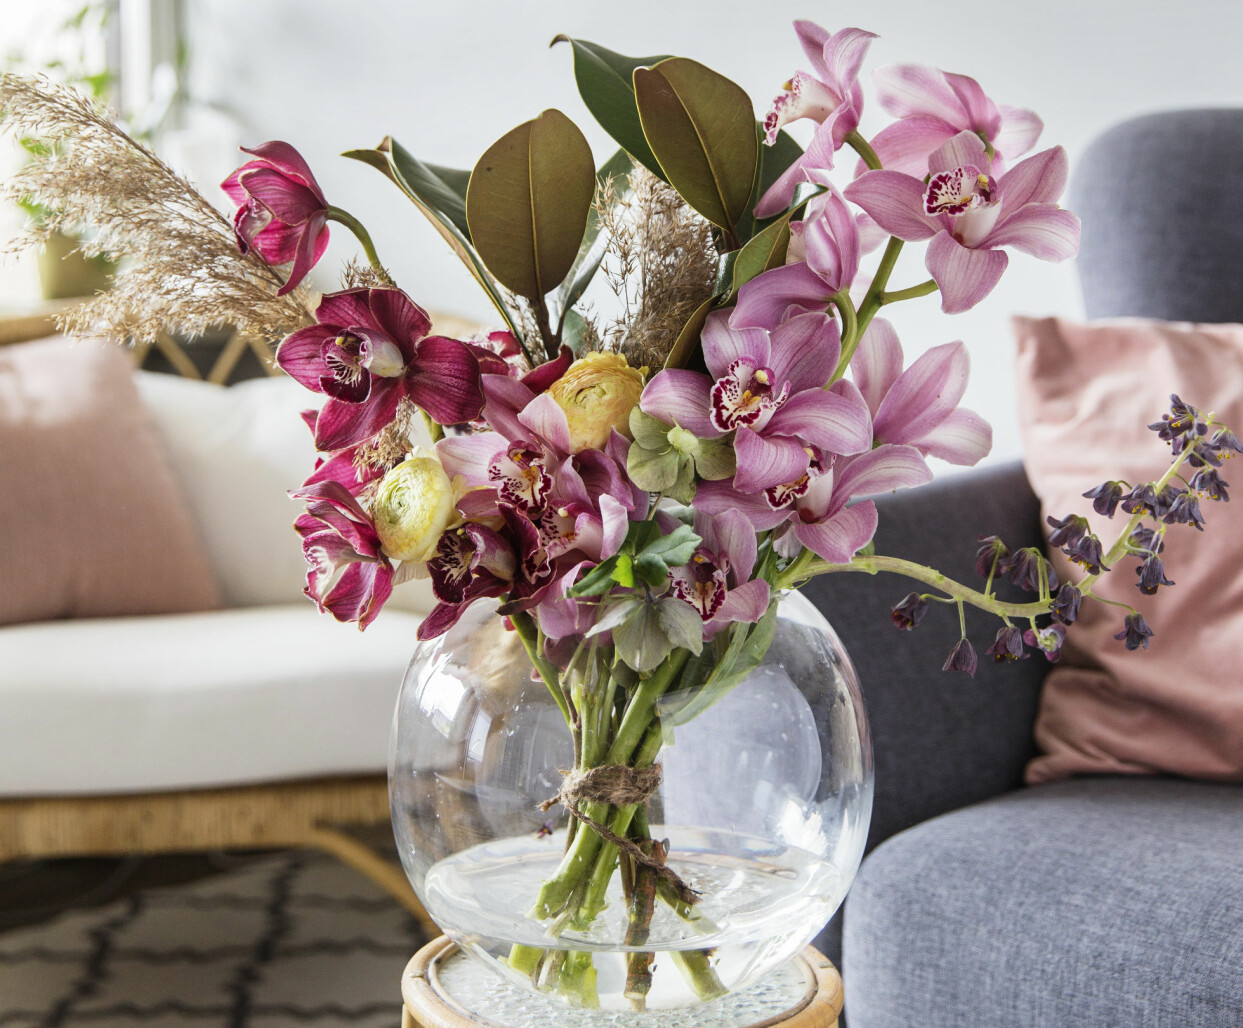 Orkidé som snittblomma i vas.